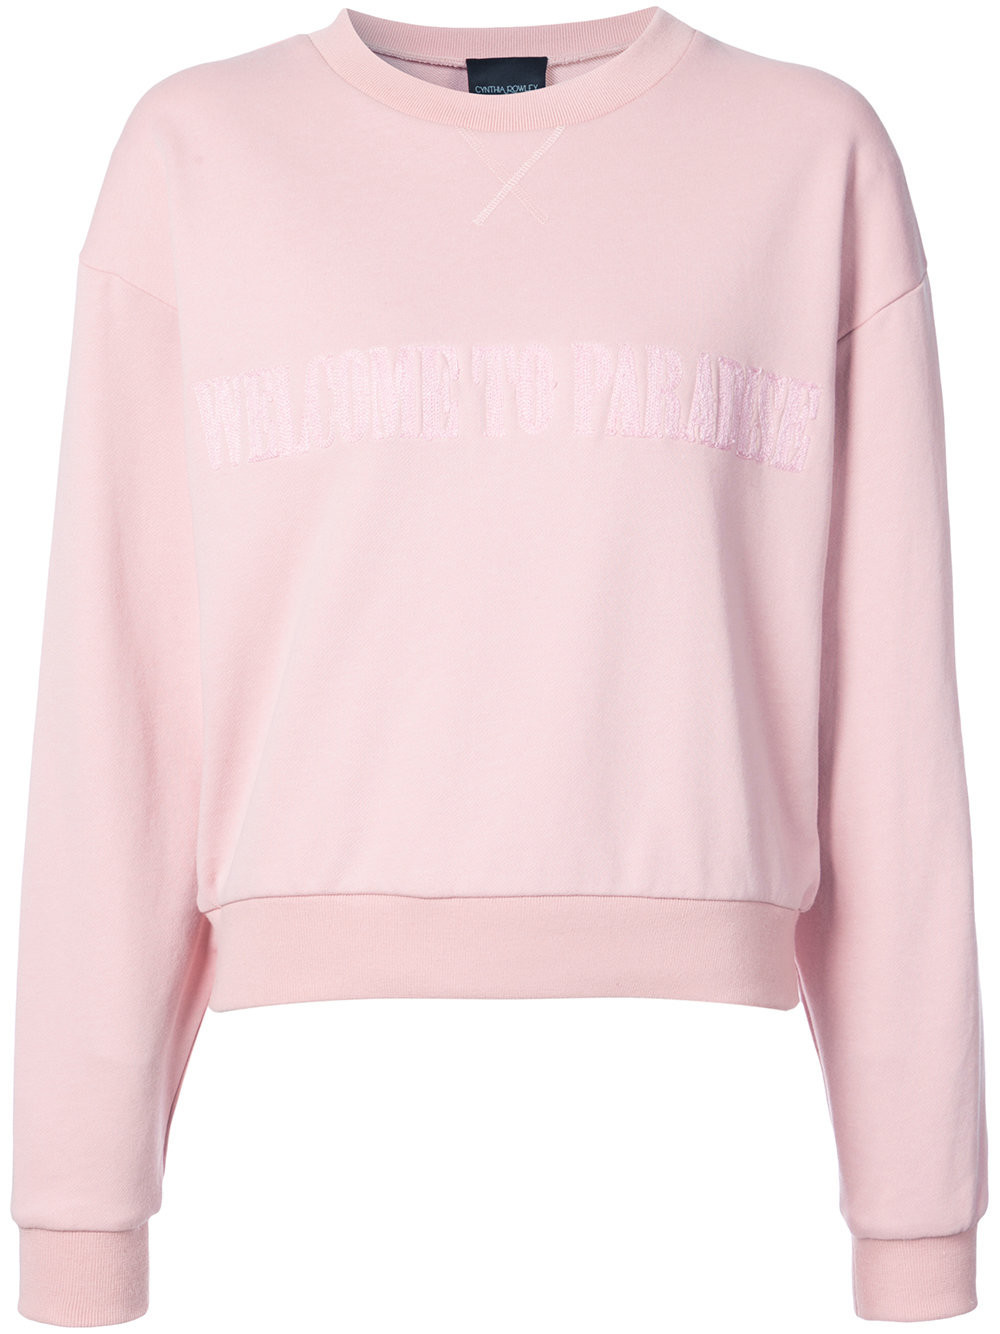 39557a1282a9aa Cynthia Rowley Paradise crewneck sweatshirt - Pink & Purple